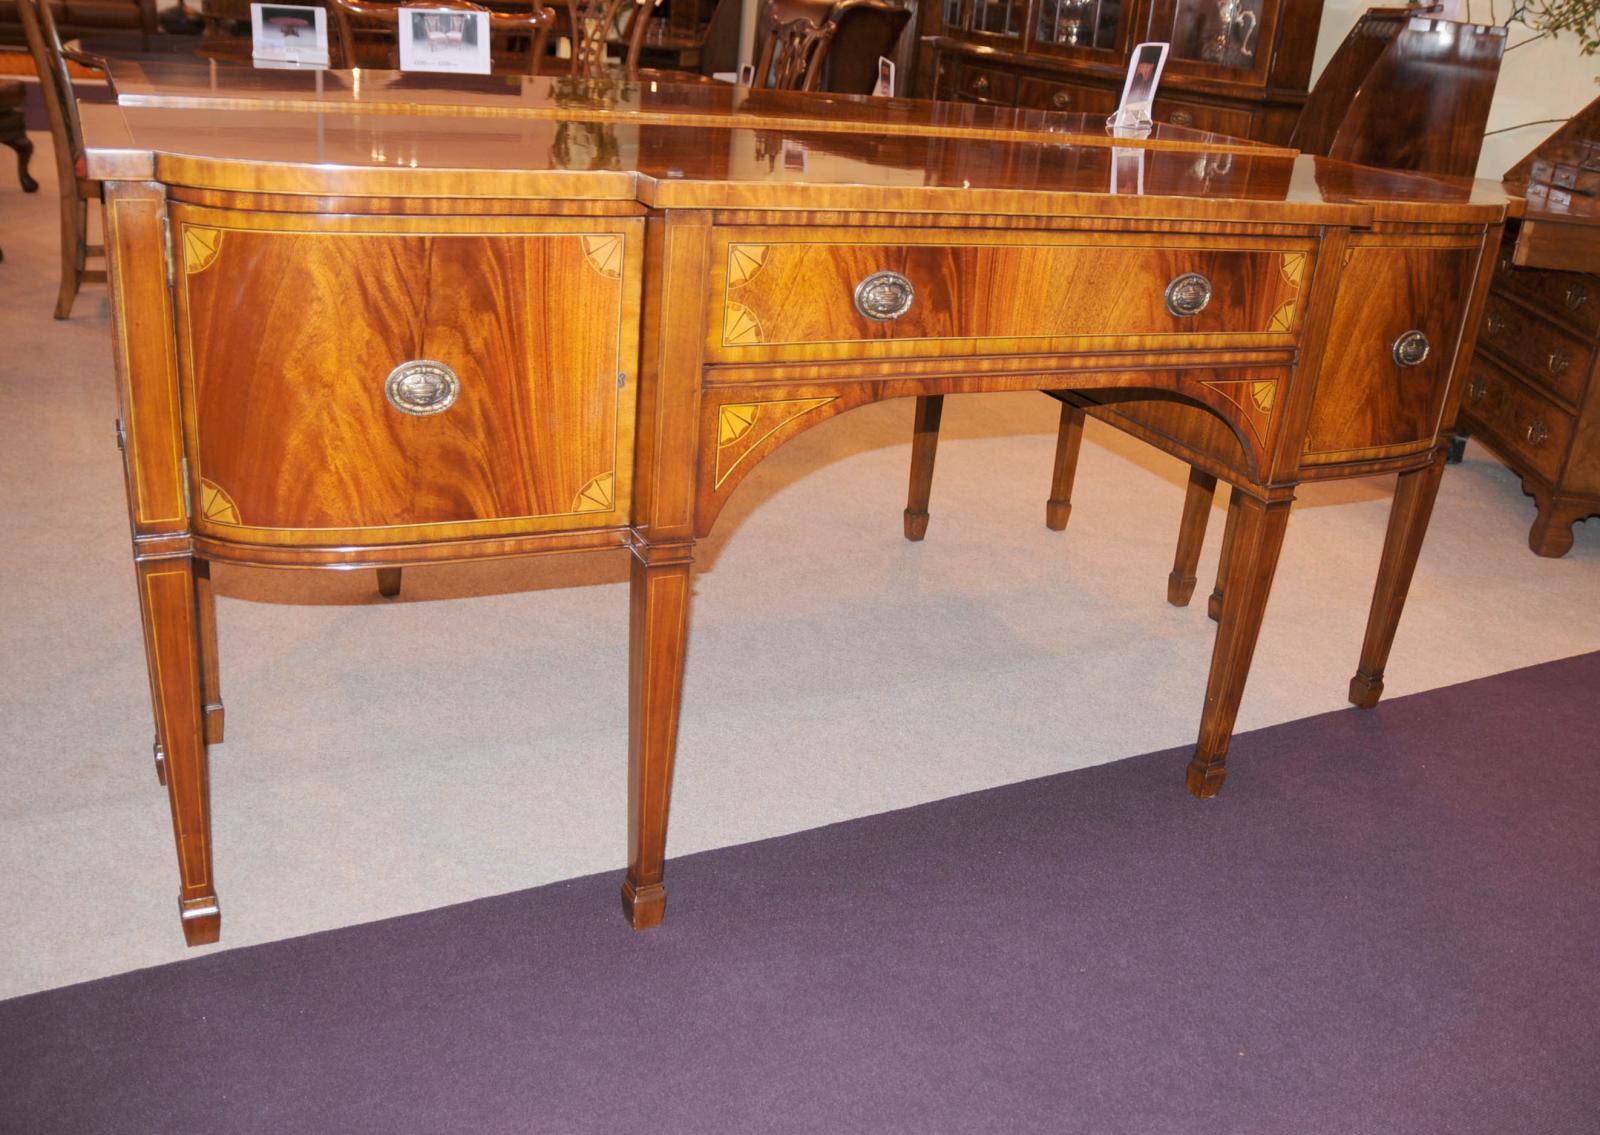 Regency Mahogany Sideboard Buffet Server Inlay Dining Furniture | eBay